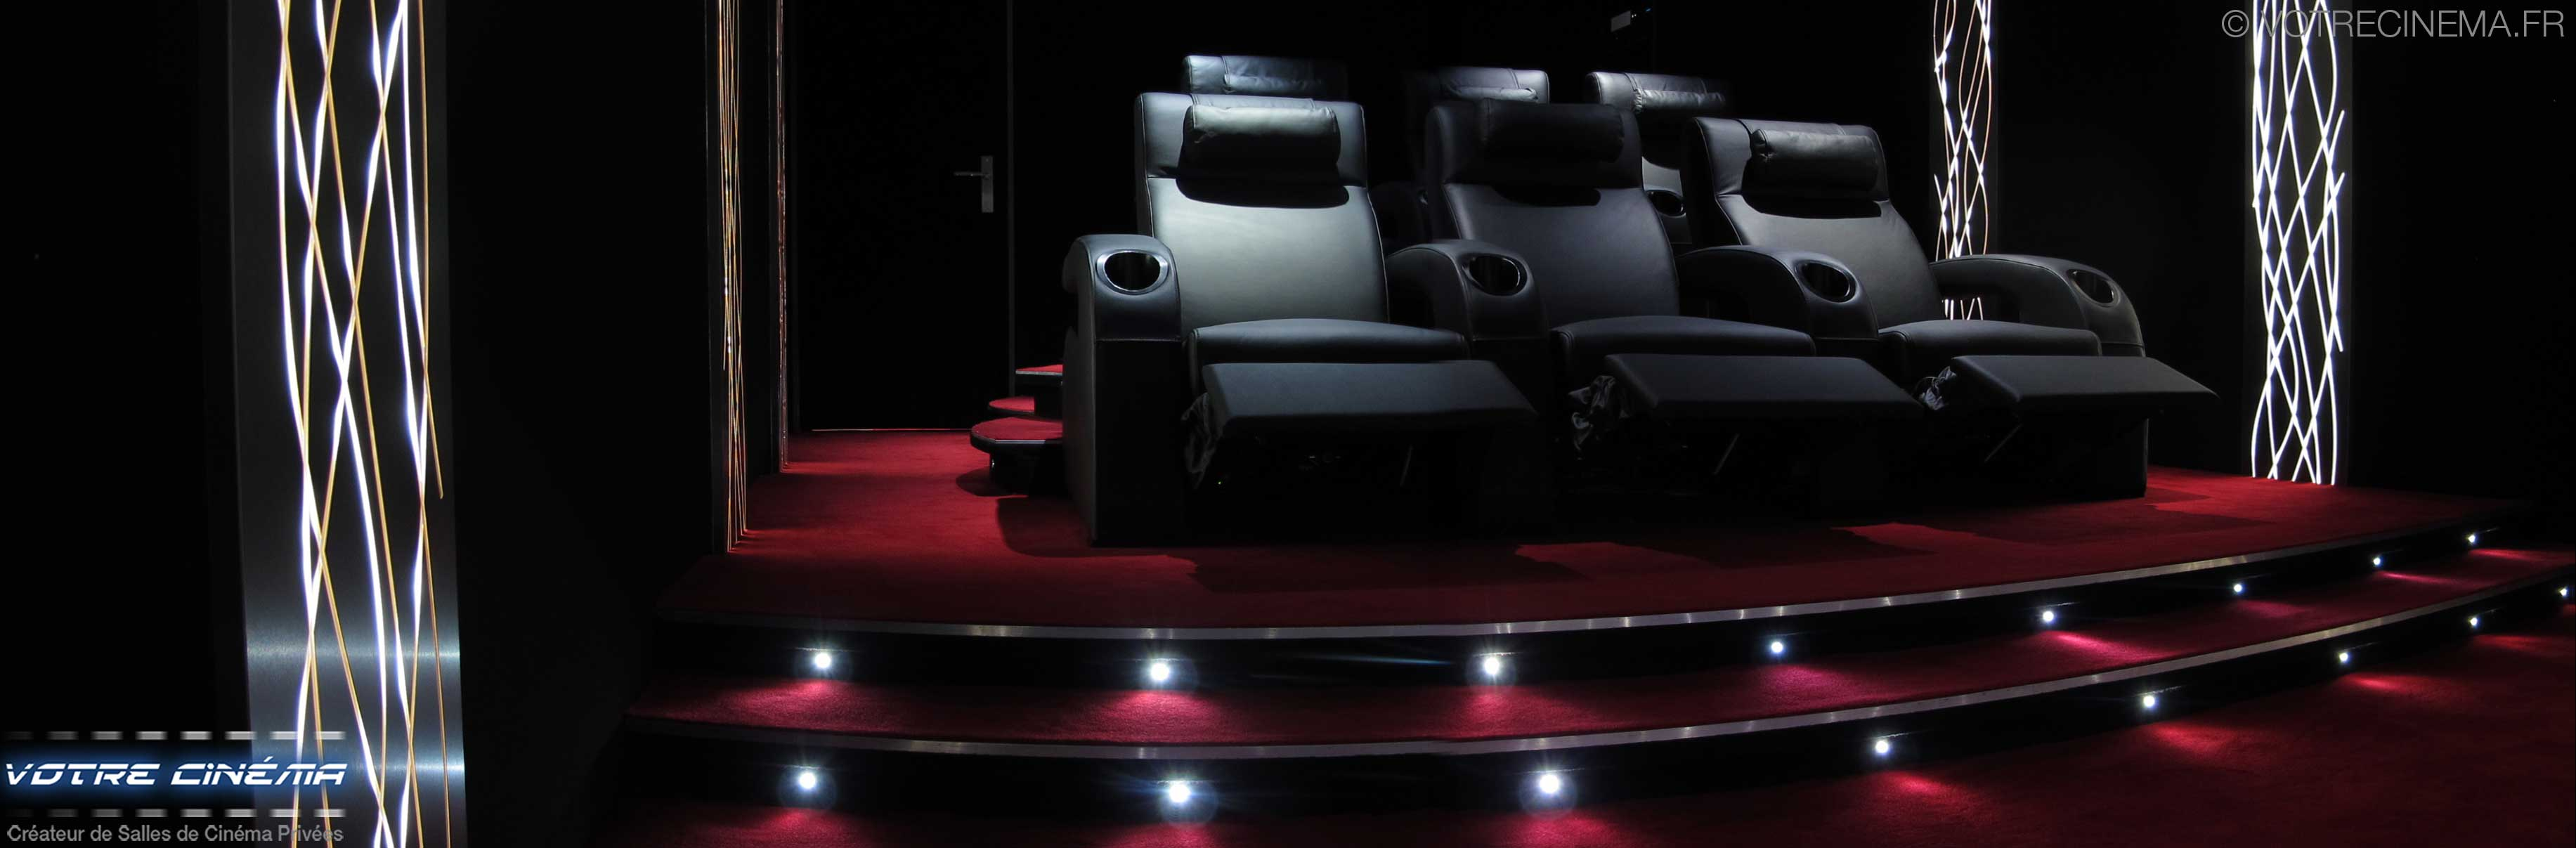 Home cinéma privé luxe Valence